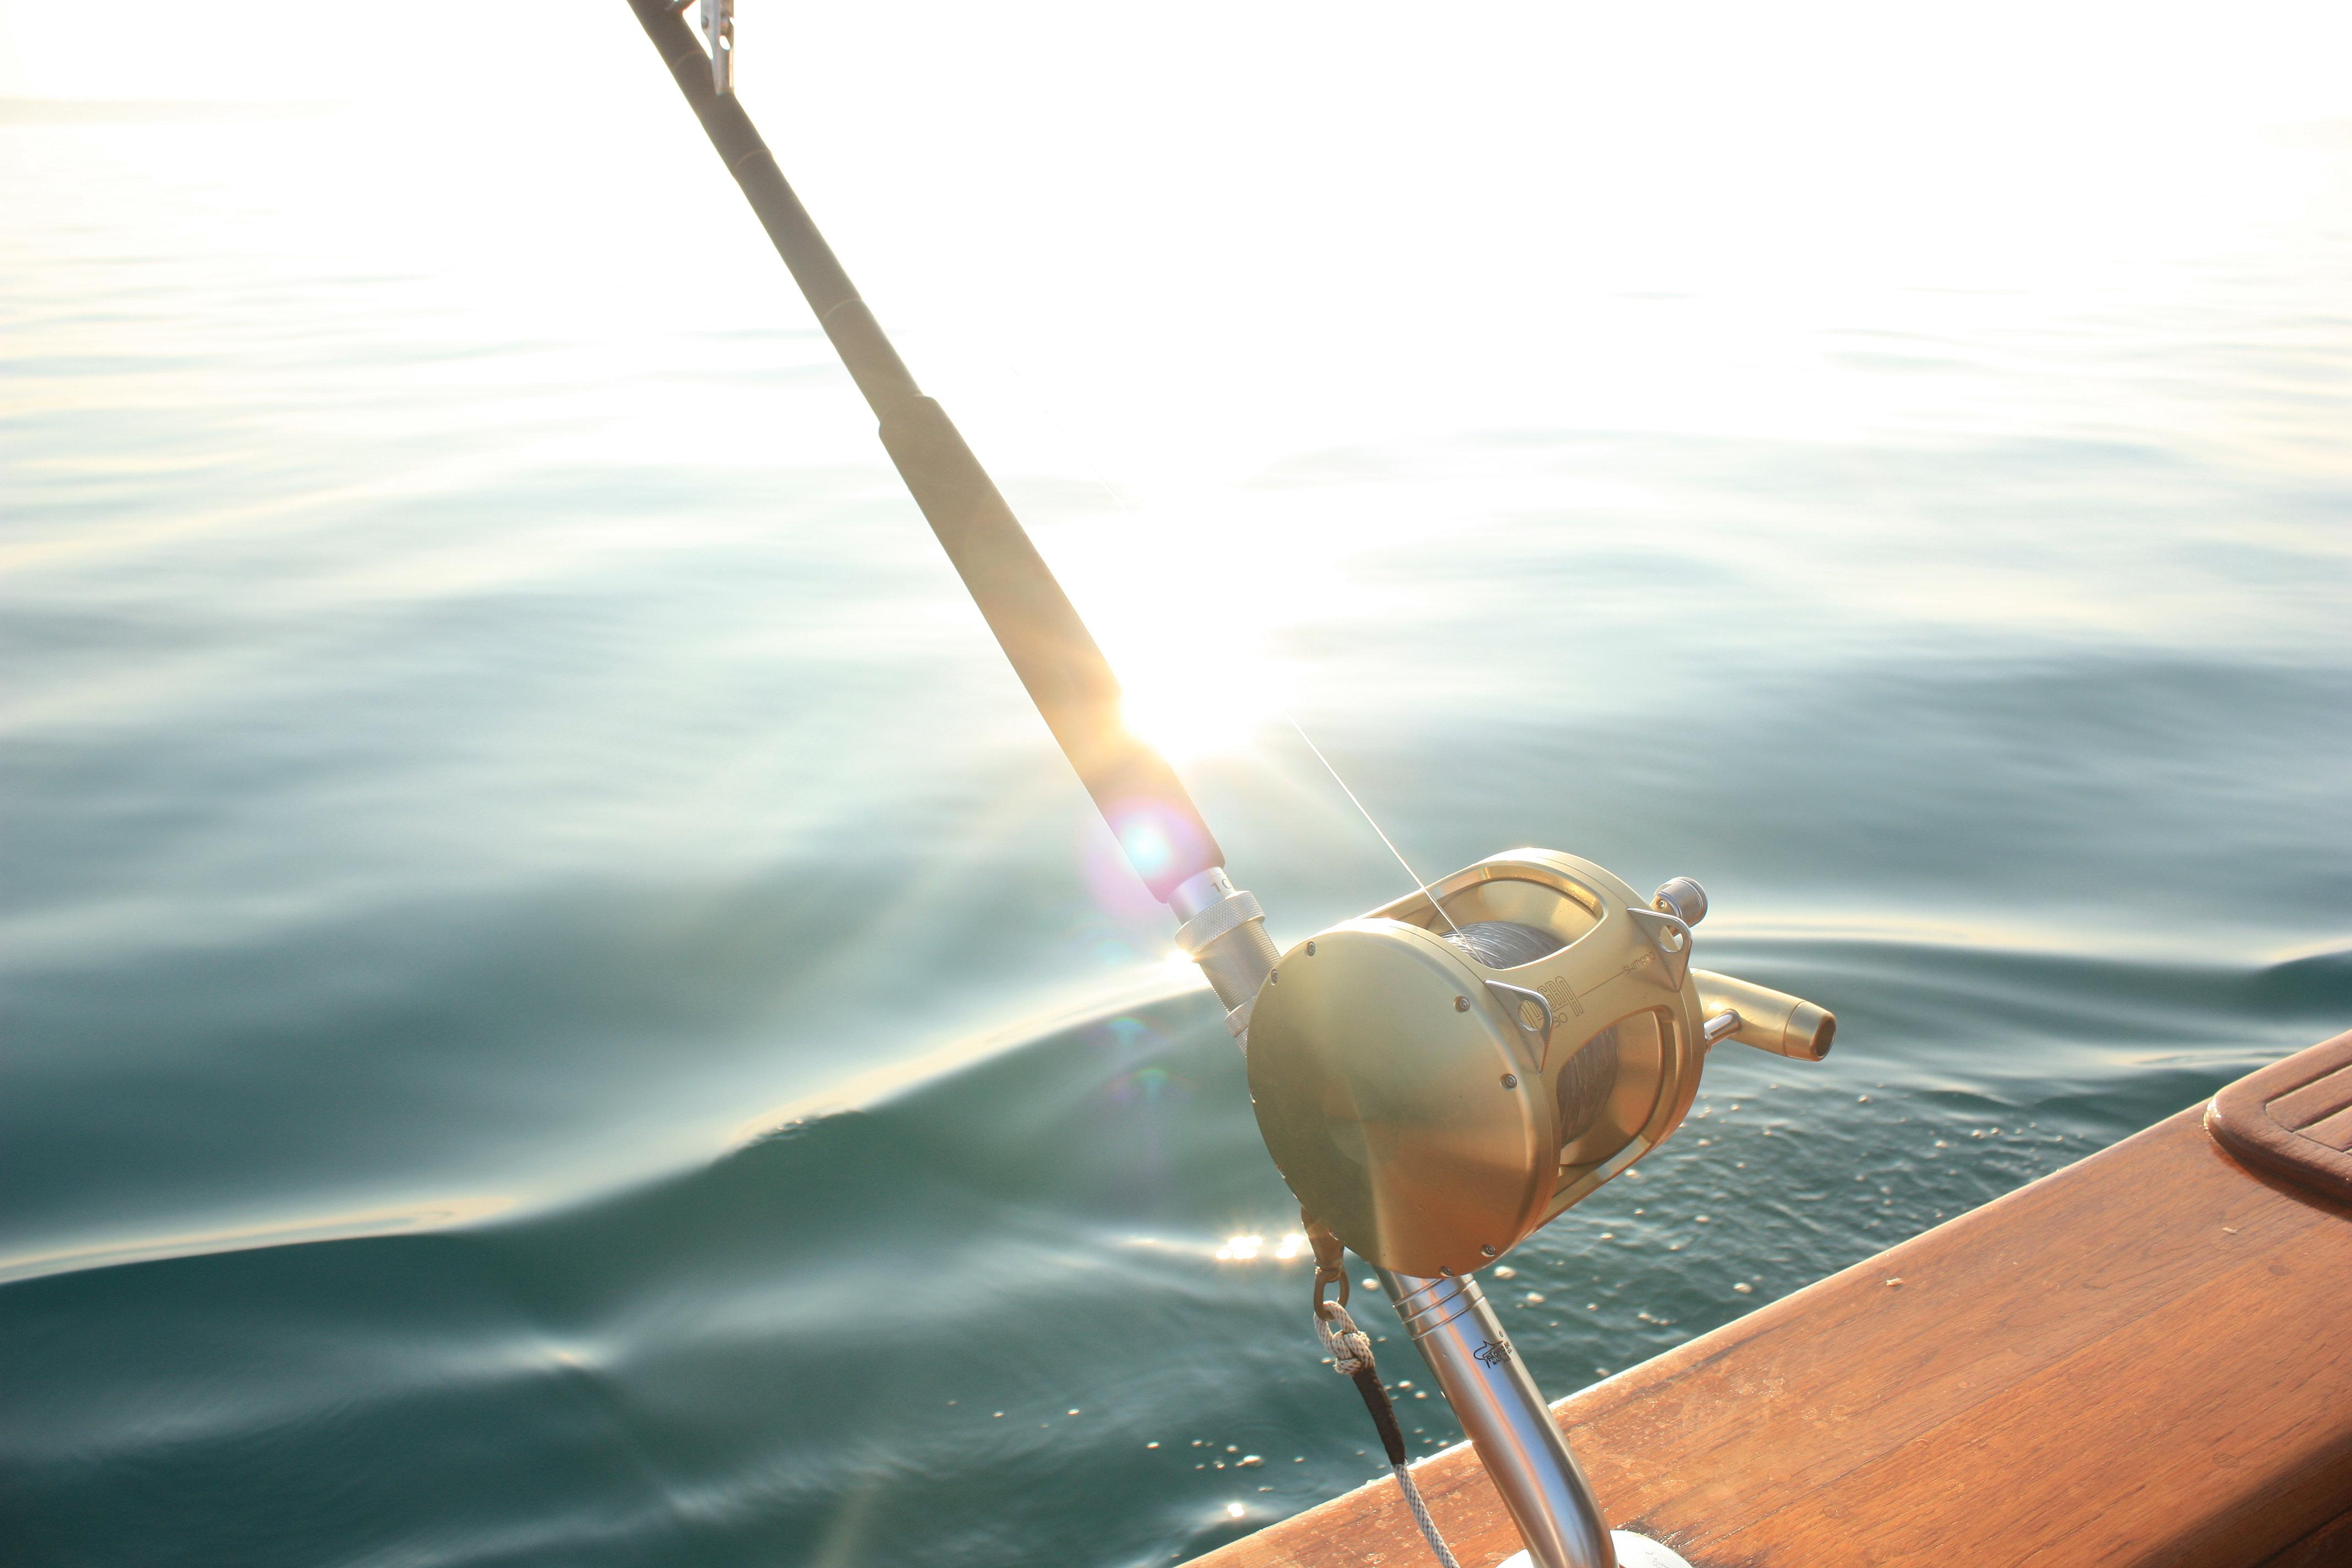 Viking charters tuna fishing newfoundland bluefin tuna for Tuna fishing rod and reel